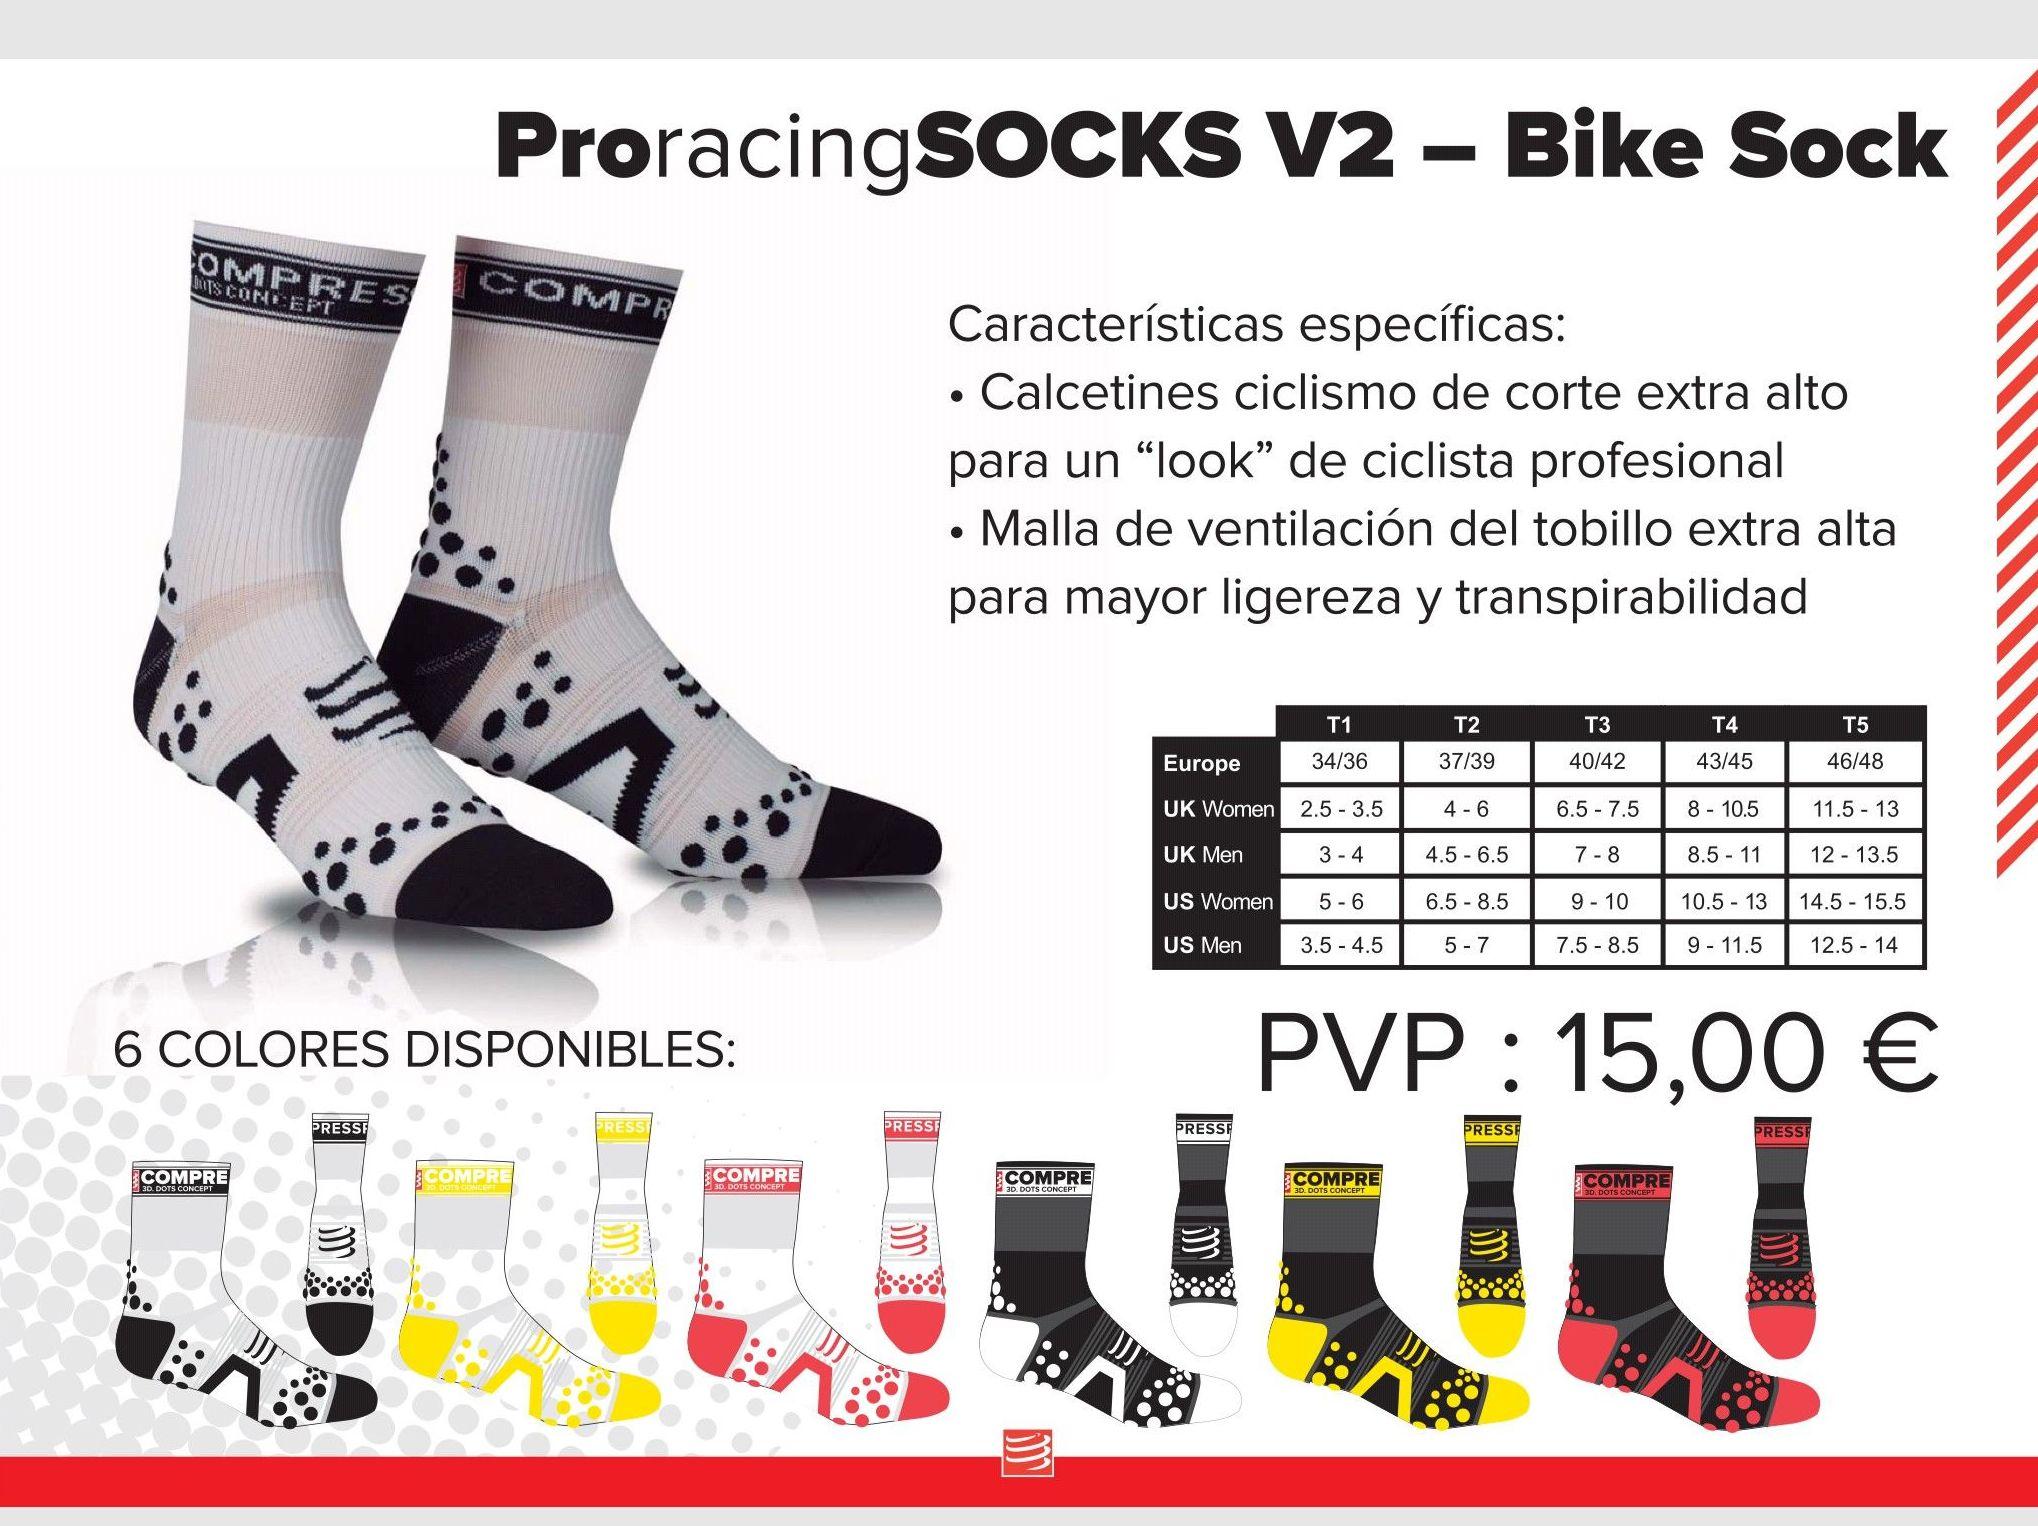 Pro racing Socks V2 Bike: TIENDA ONLINE de Ortopedia La Fama